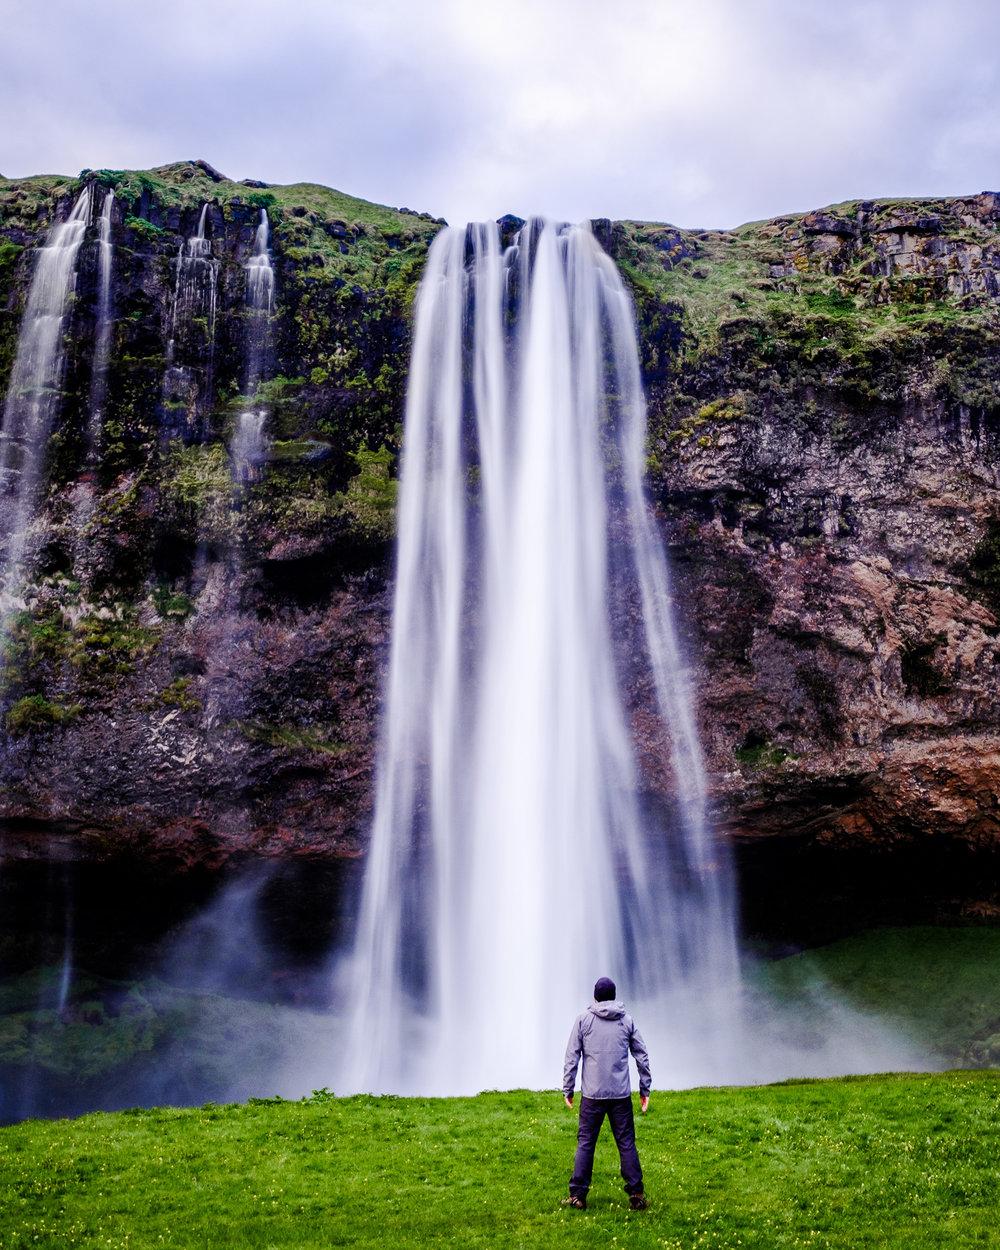 Kevin_M_Halifax_Iceland_seljalandsfoss_portrait.jpg